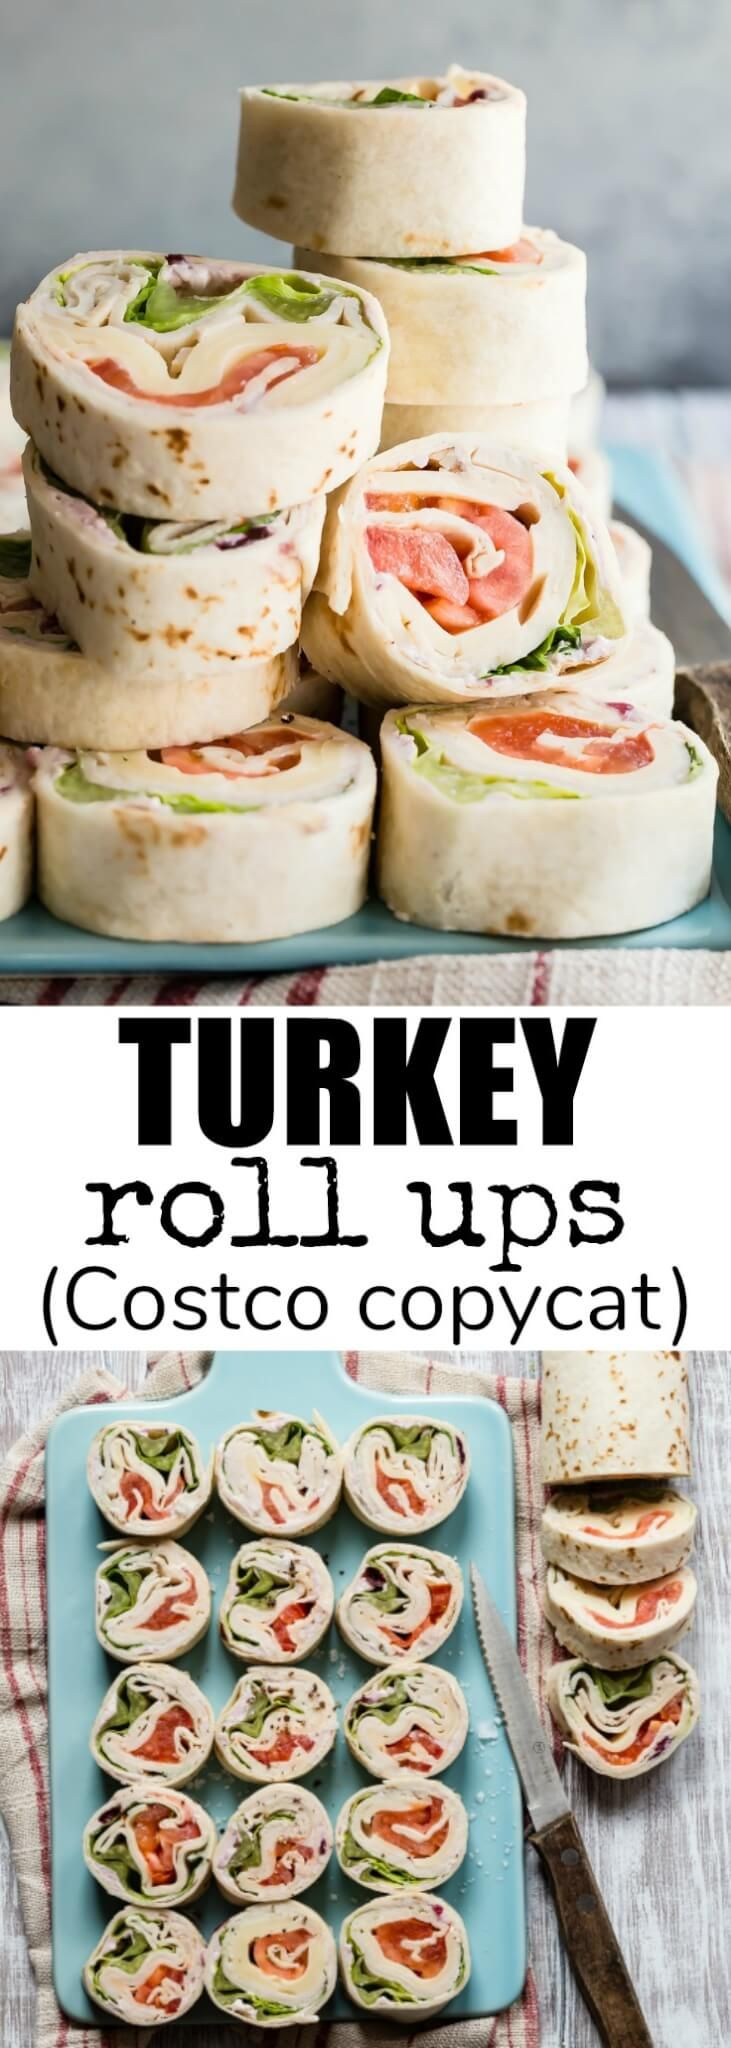 Turkey Roll Ups (Costco Copycat) Recipe Our Favorite